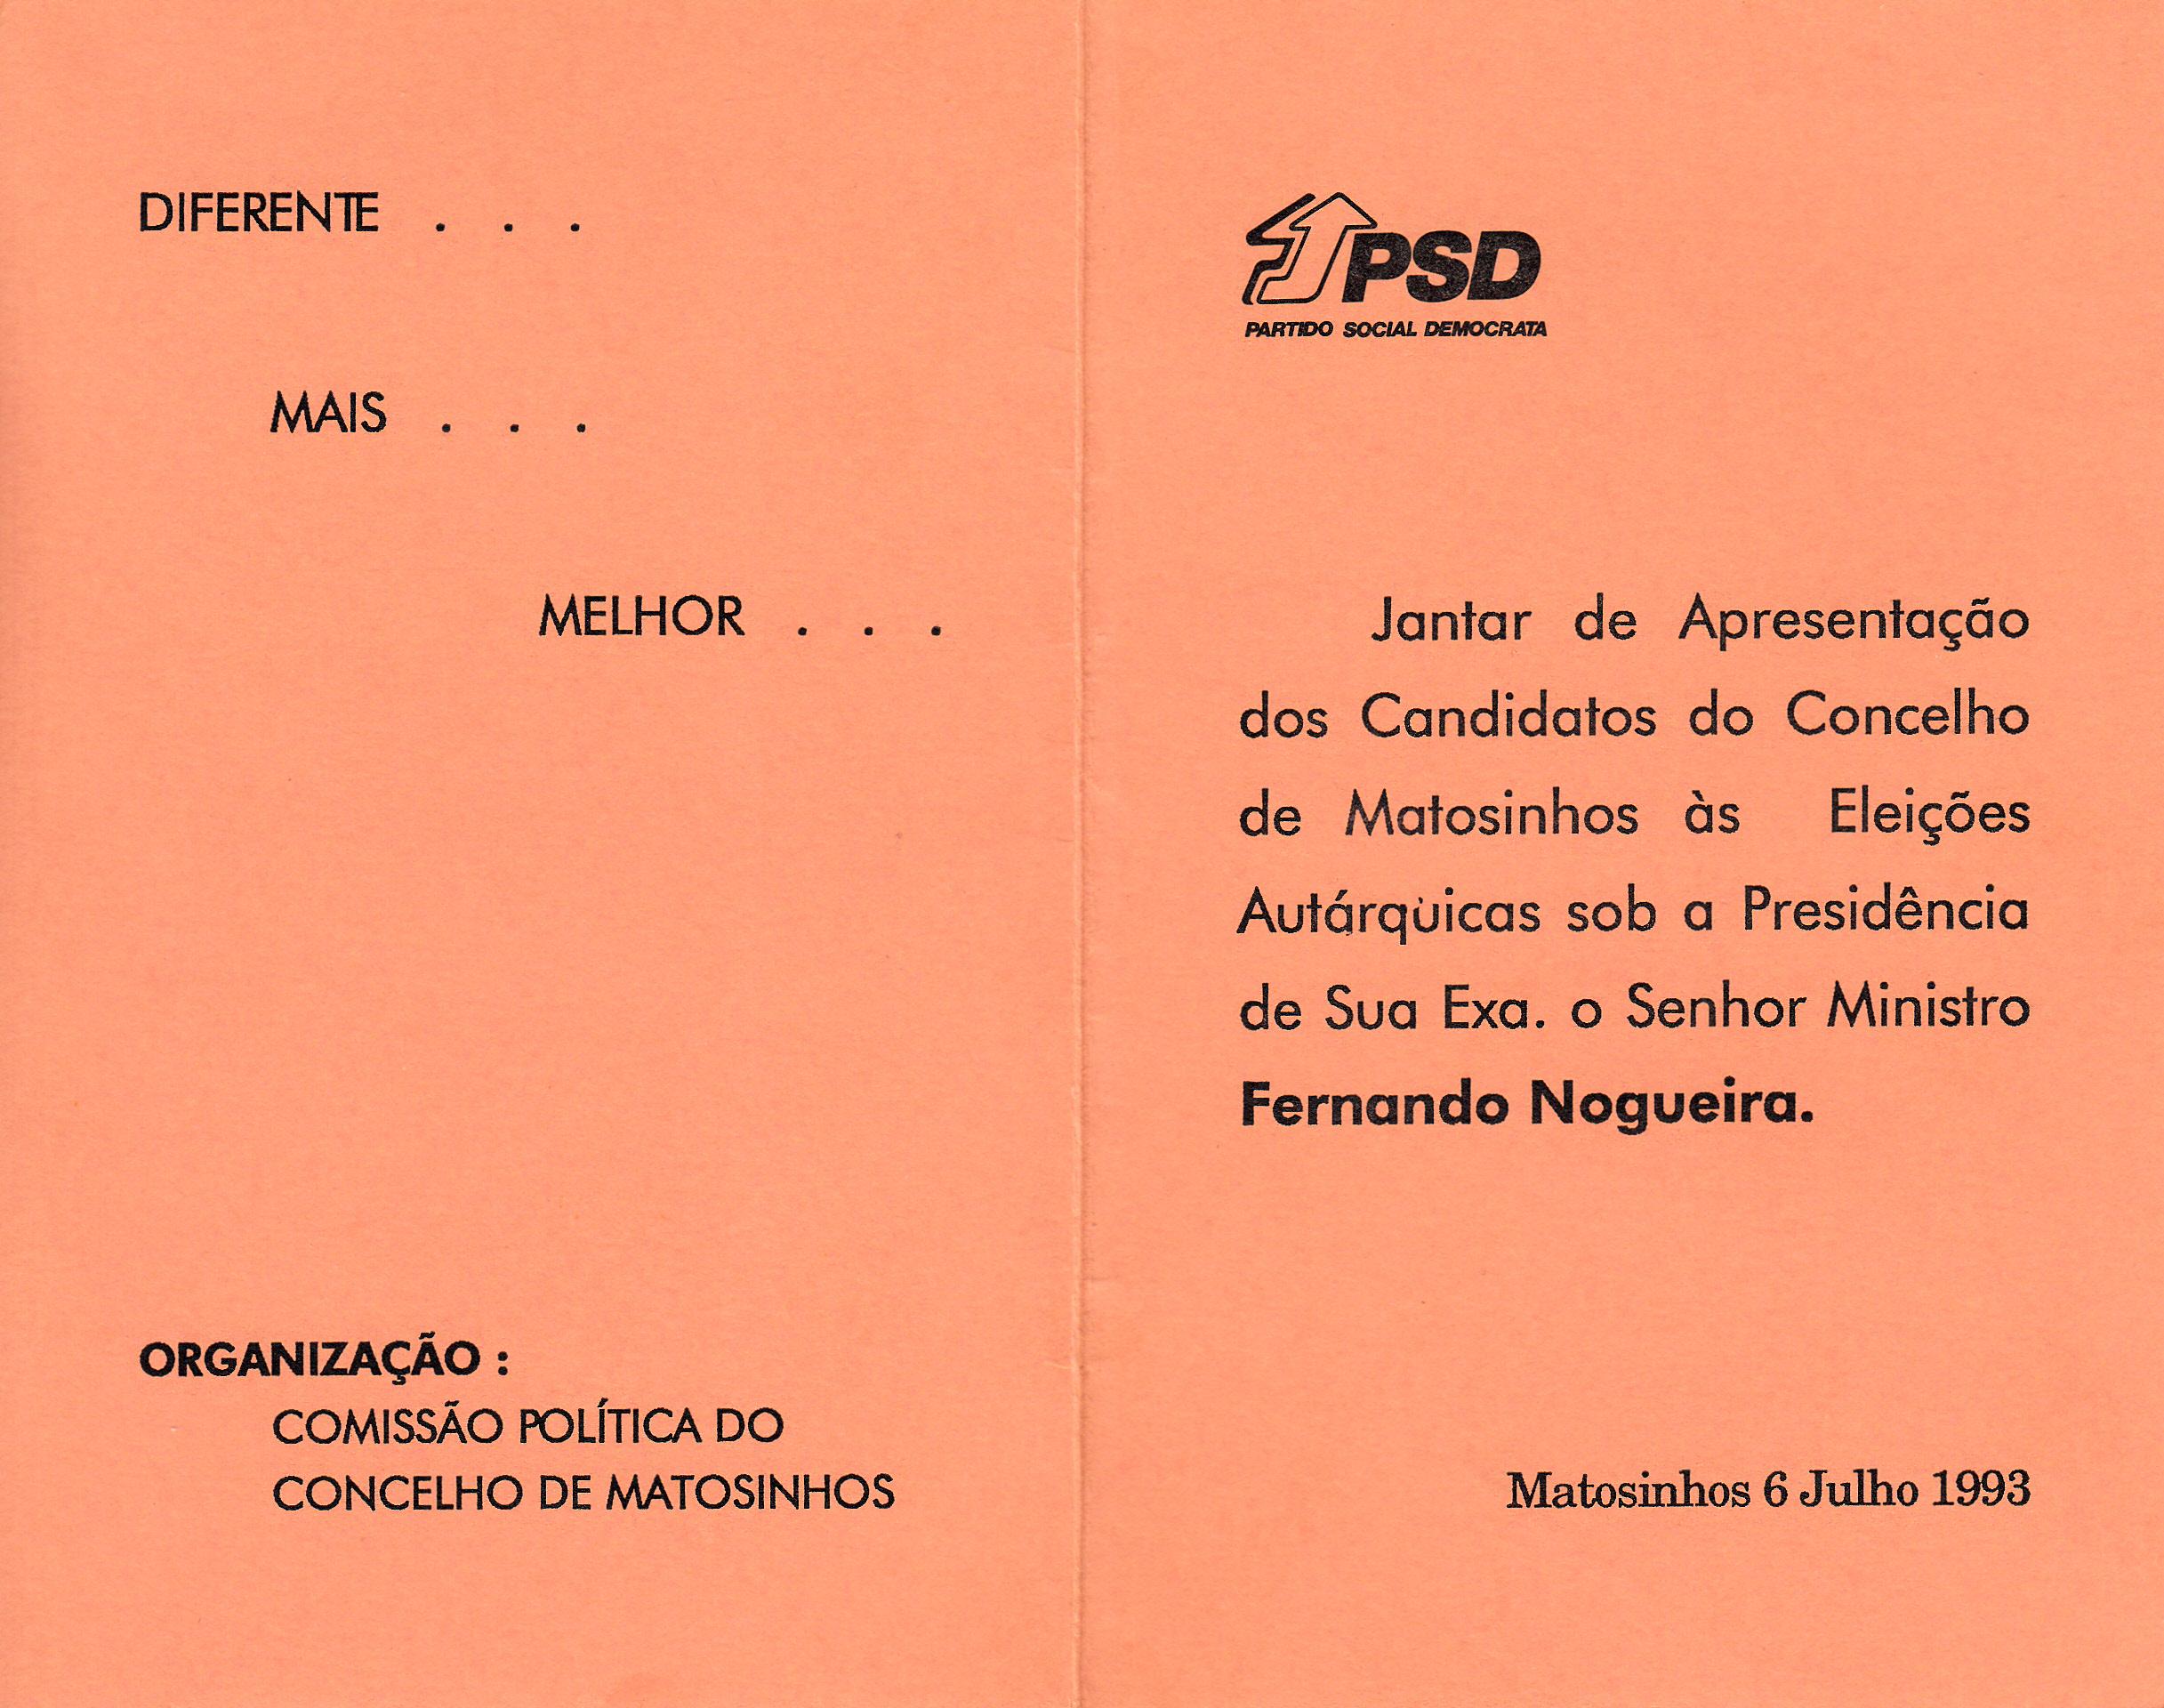 PSD_1993_Matosinhos_0001